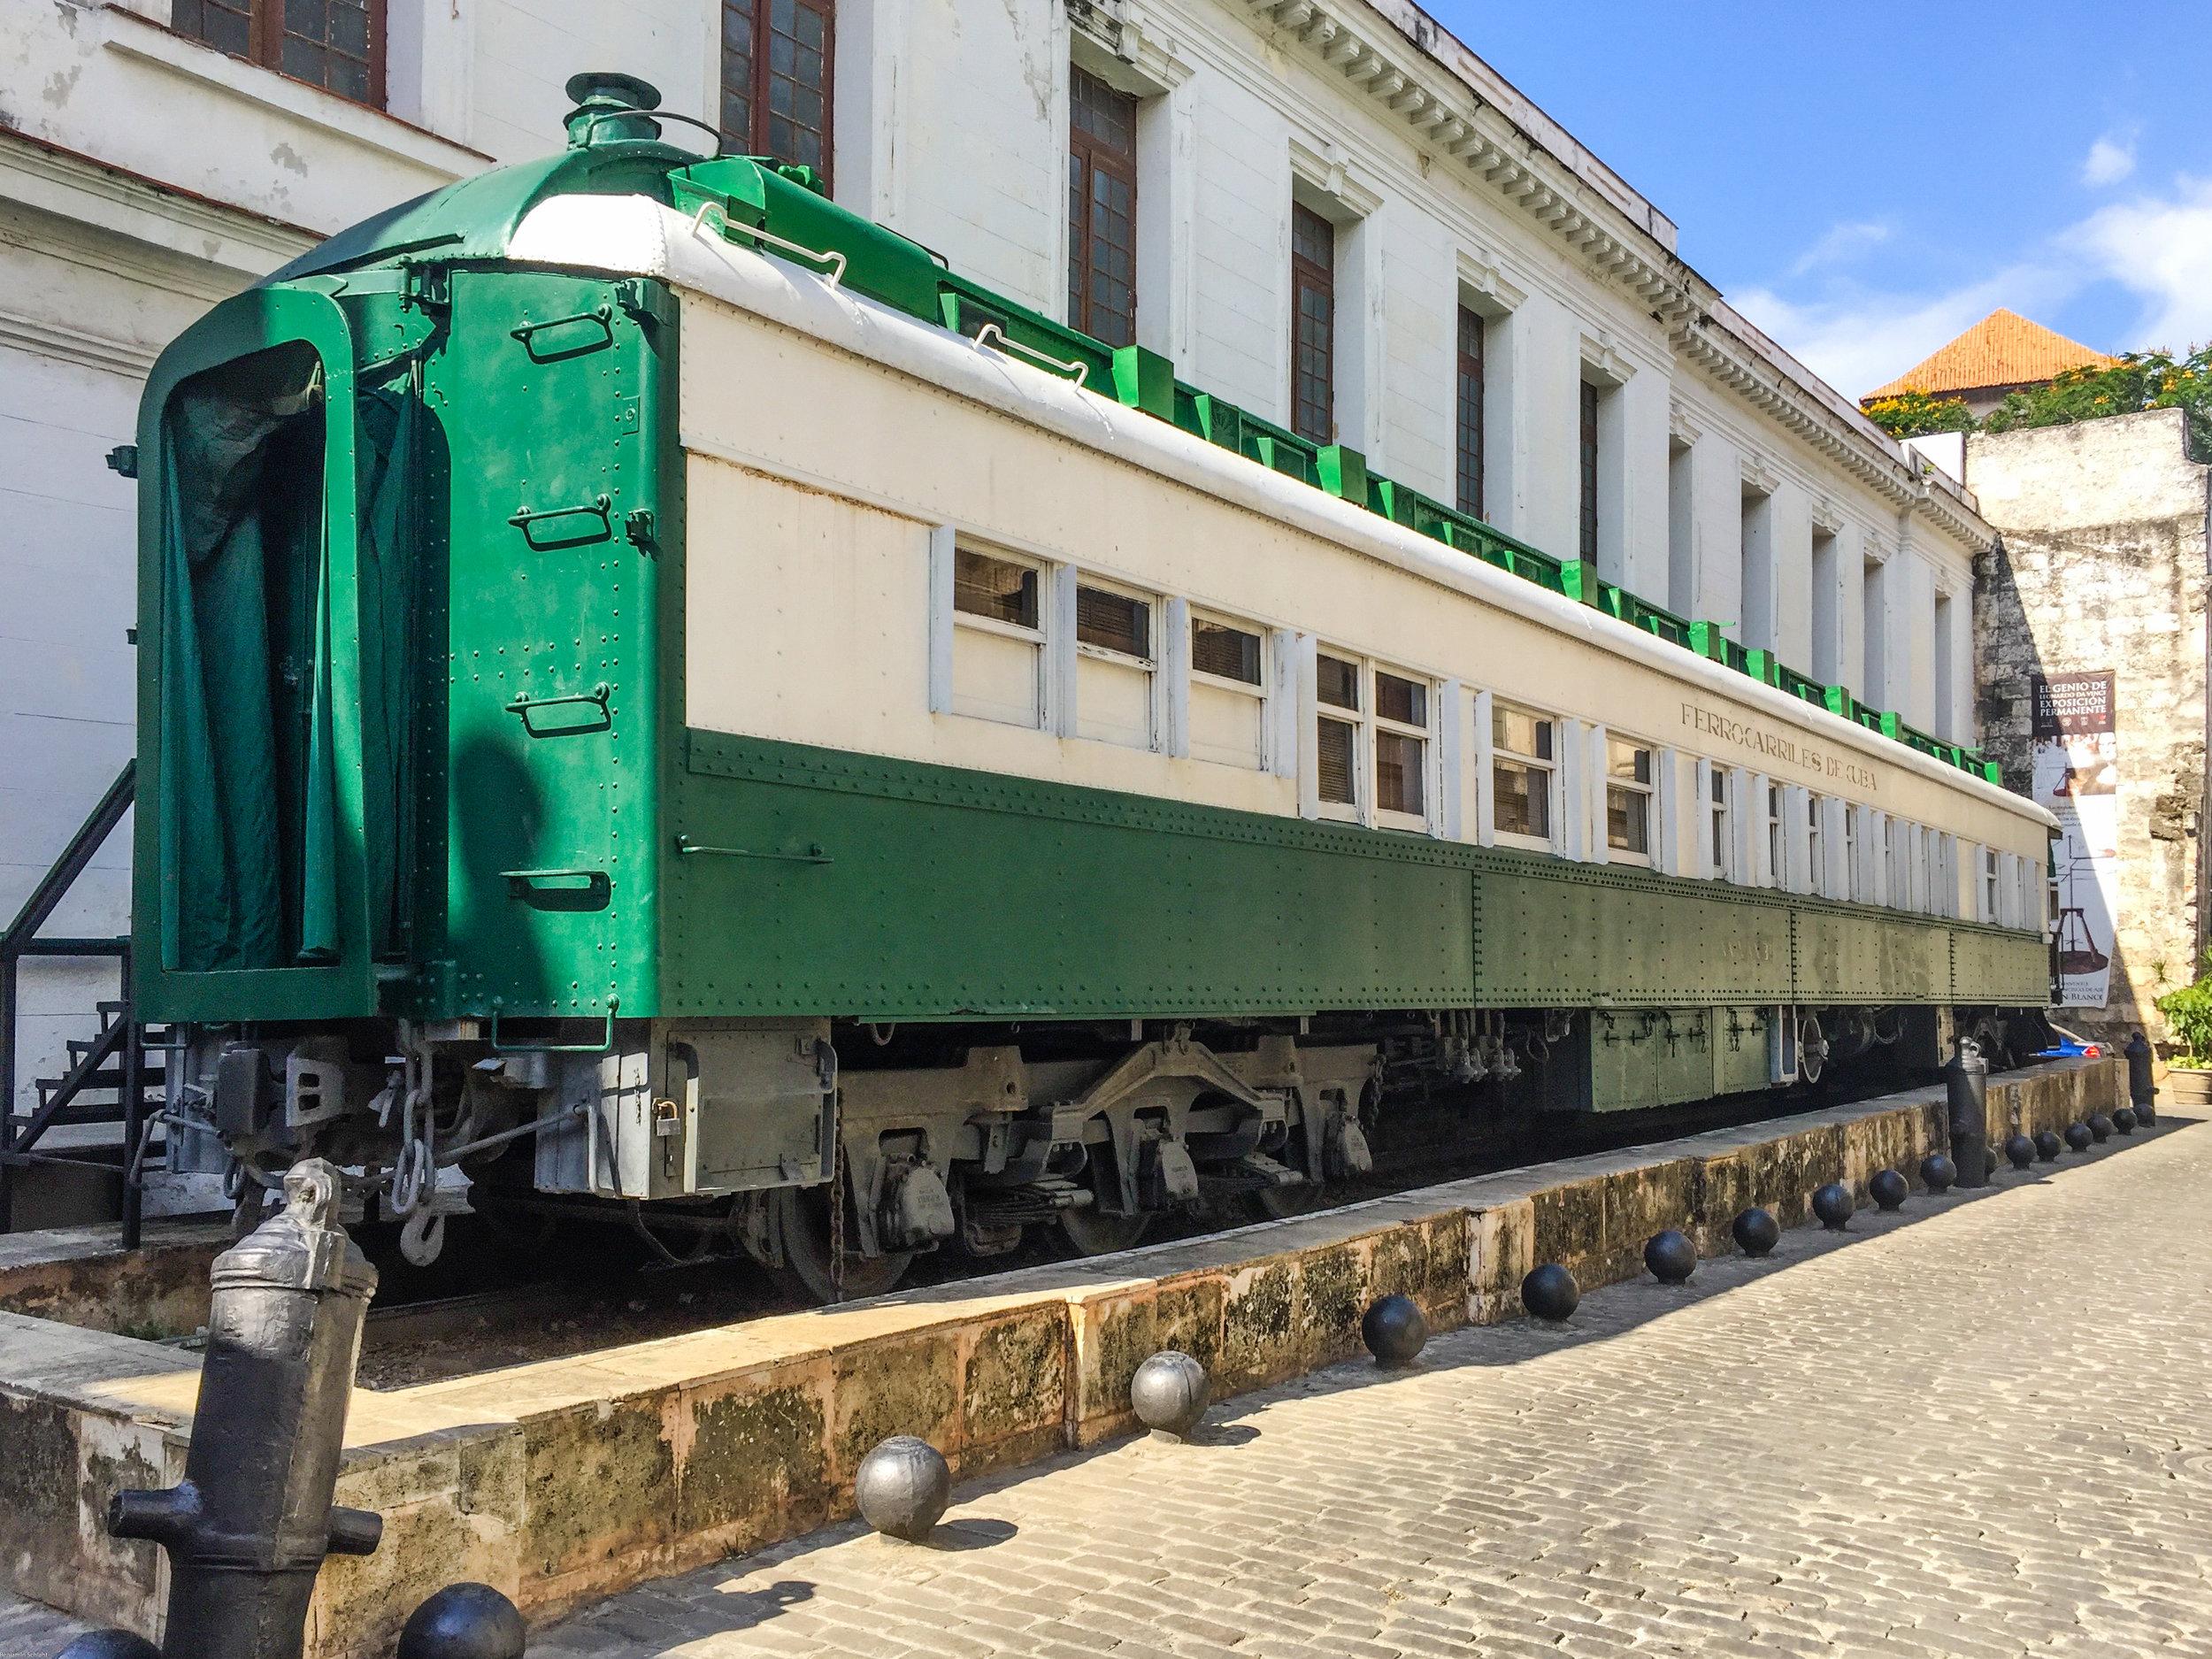 A random green train car we found in Havana